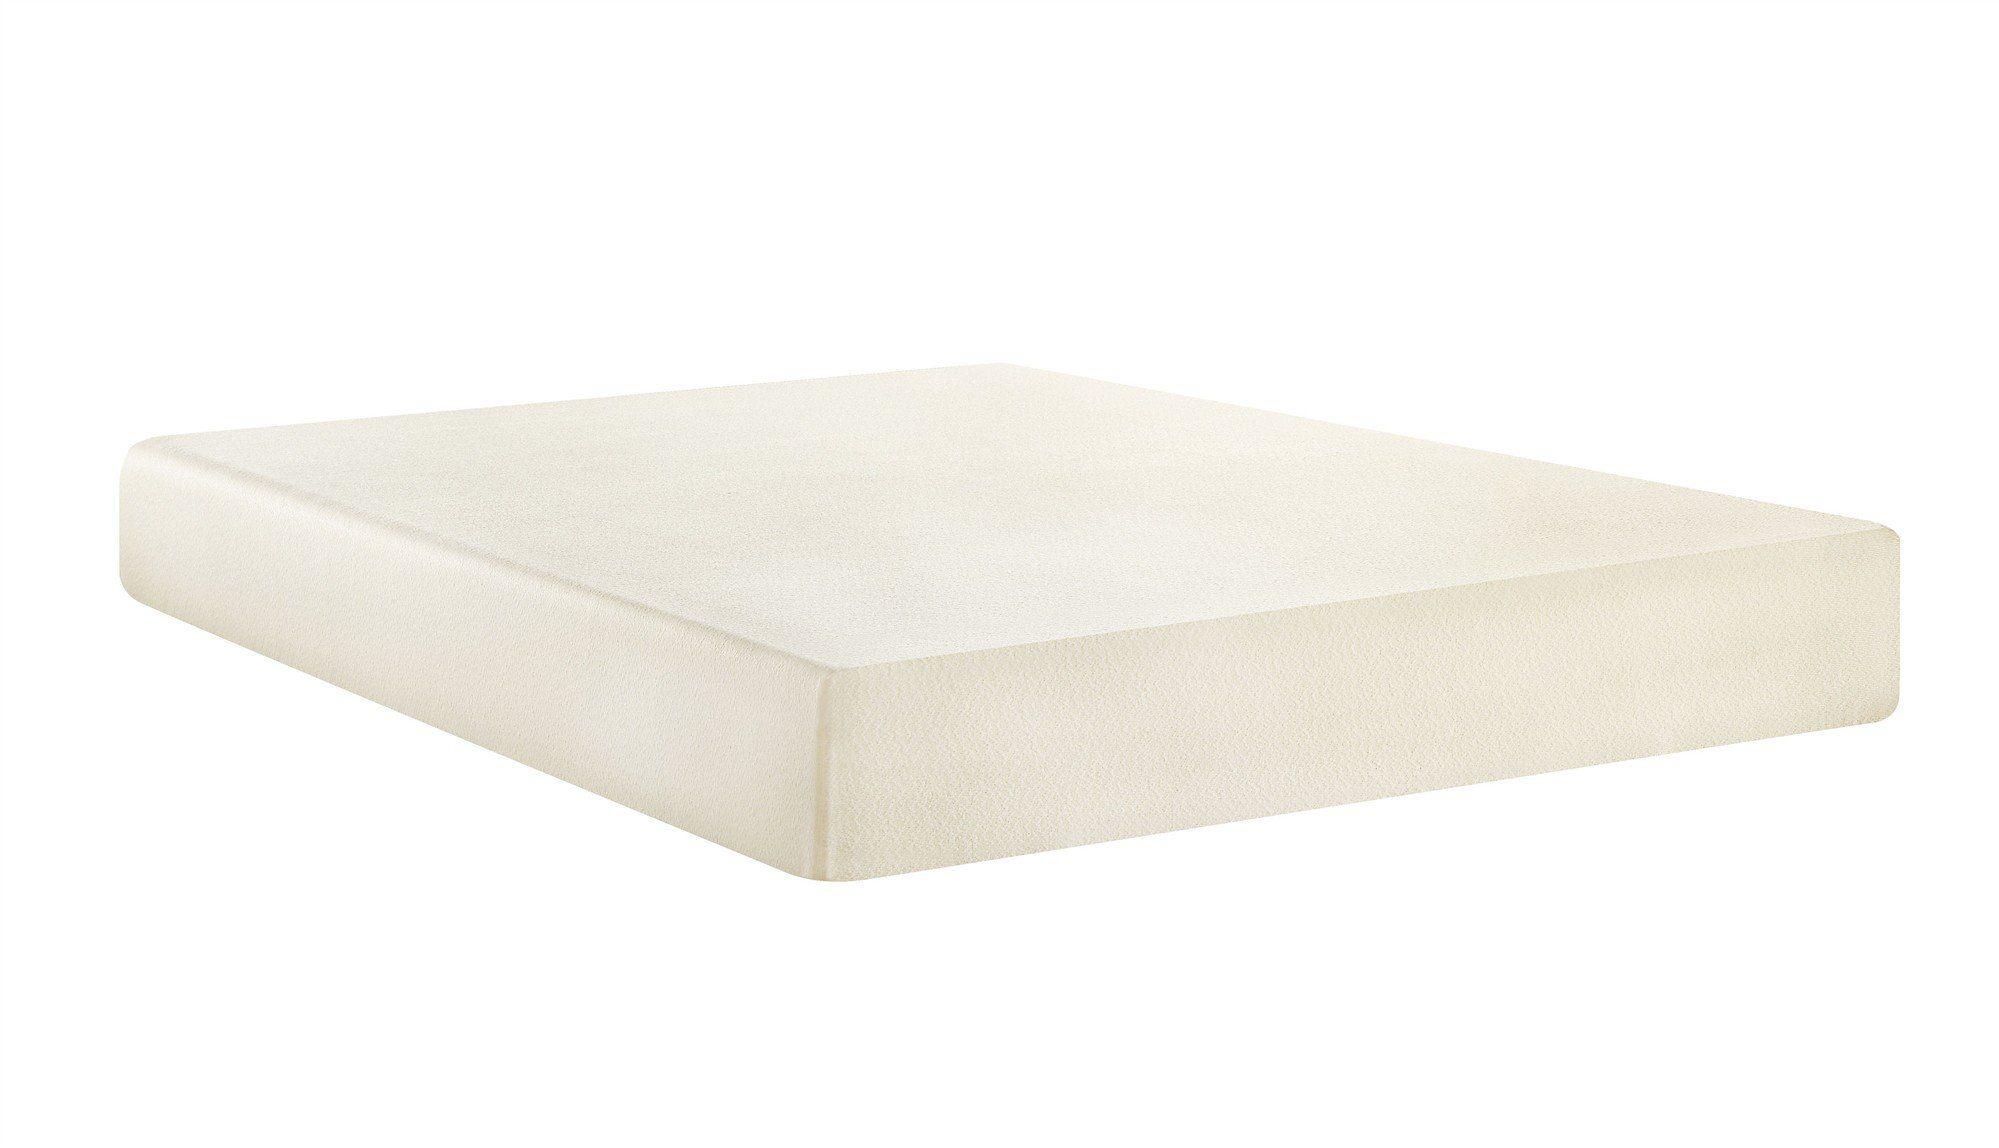 Signature Sleep Memoir 8 Inch Memory Foam Mattress With Certipurus